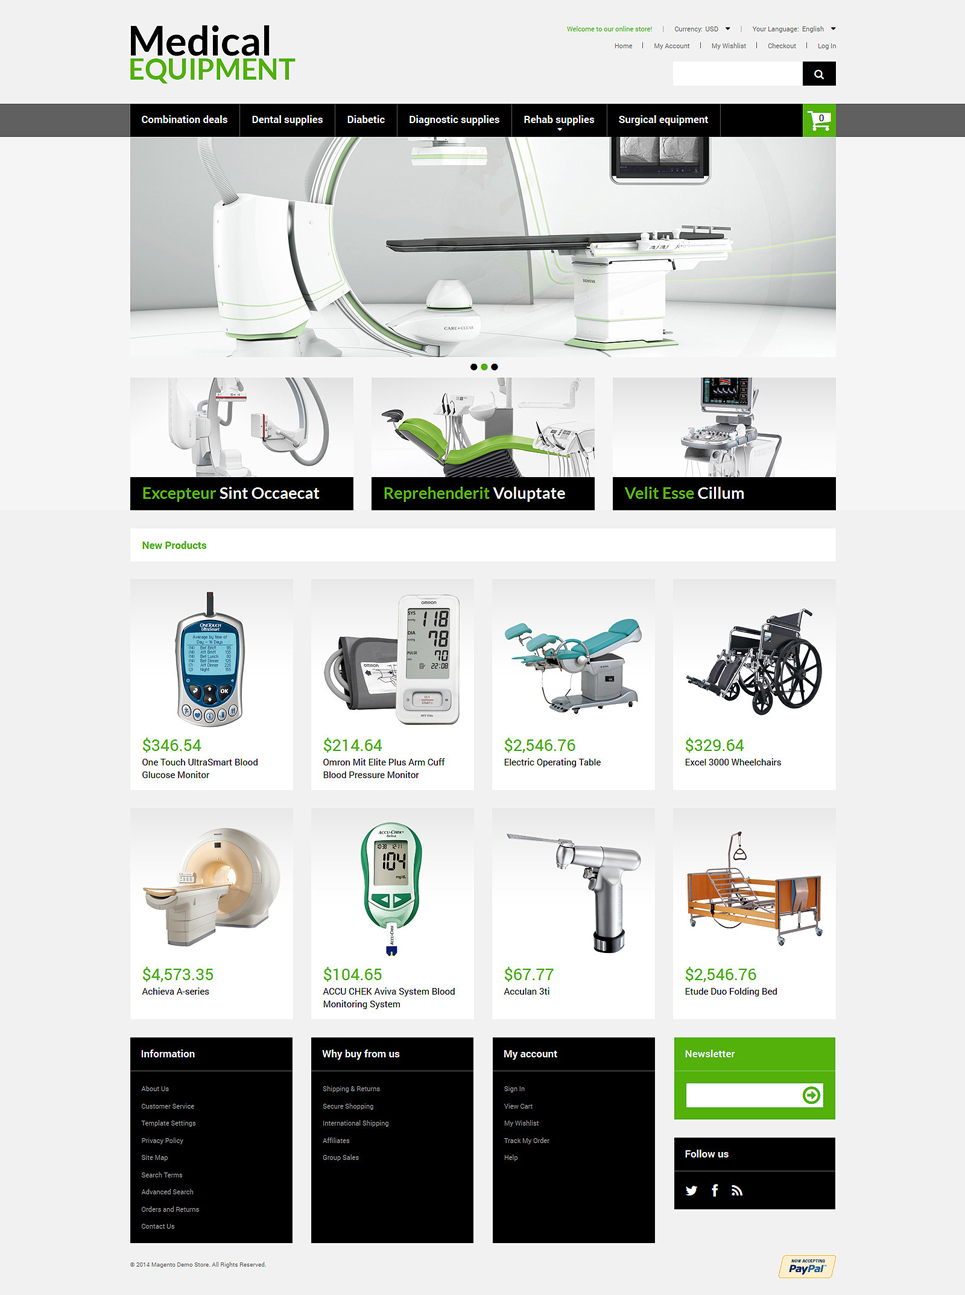 The Medical Equipment Magento Theme